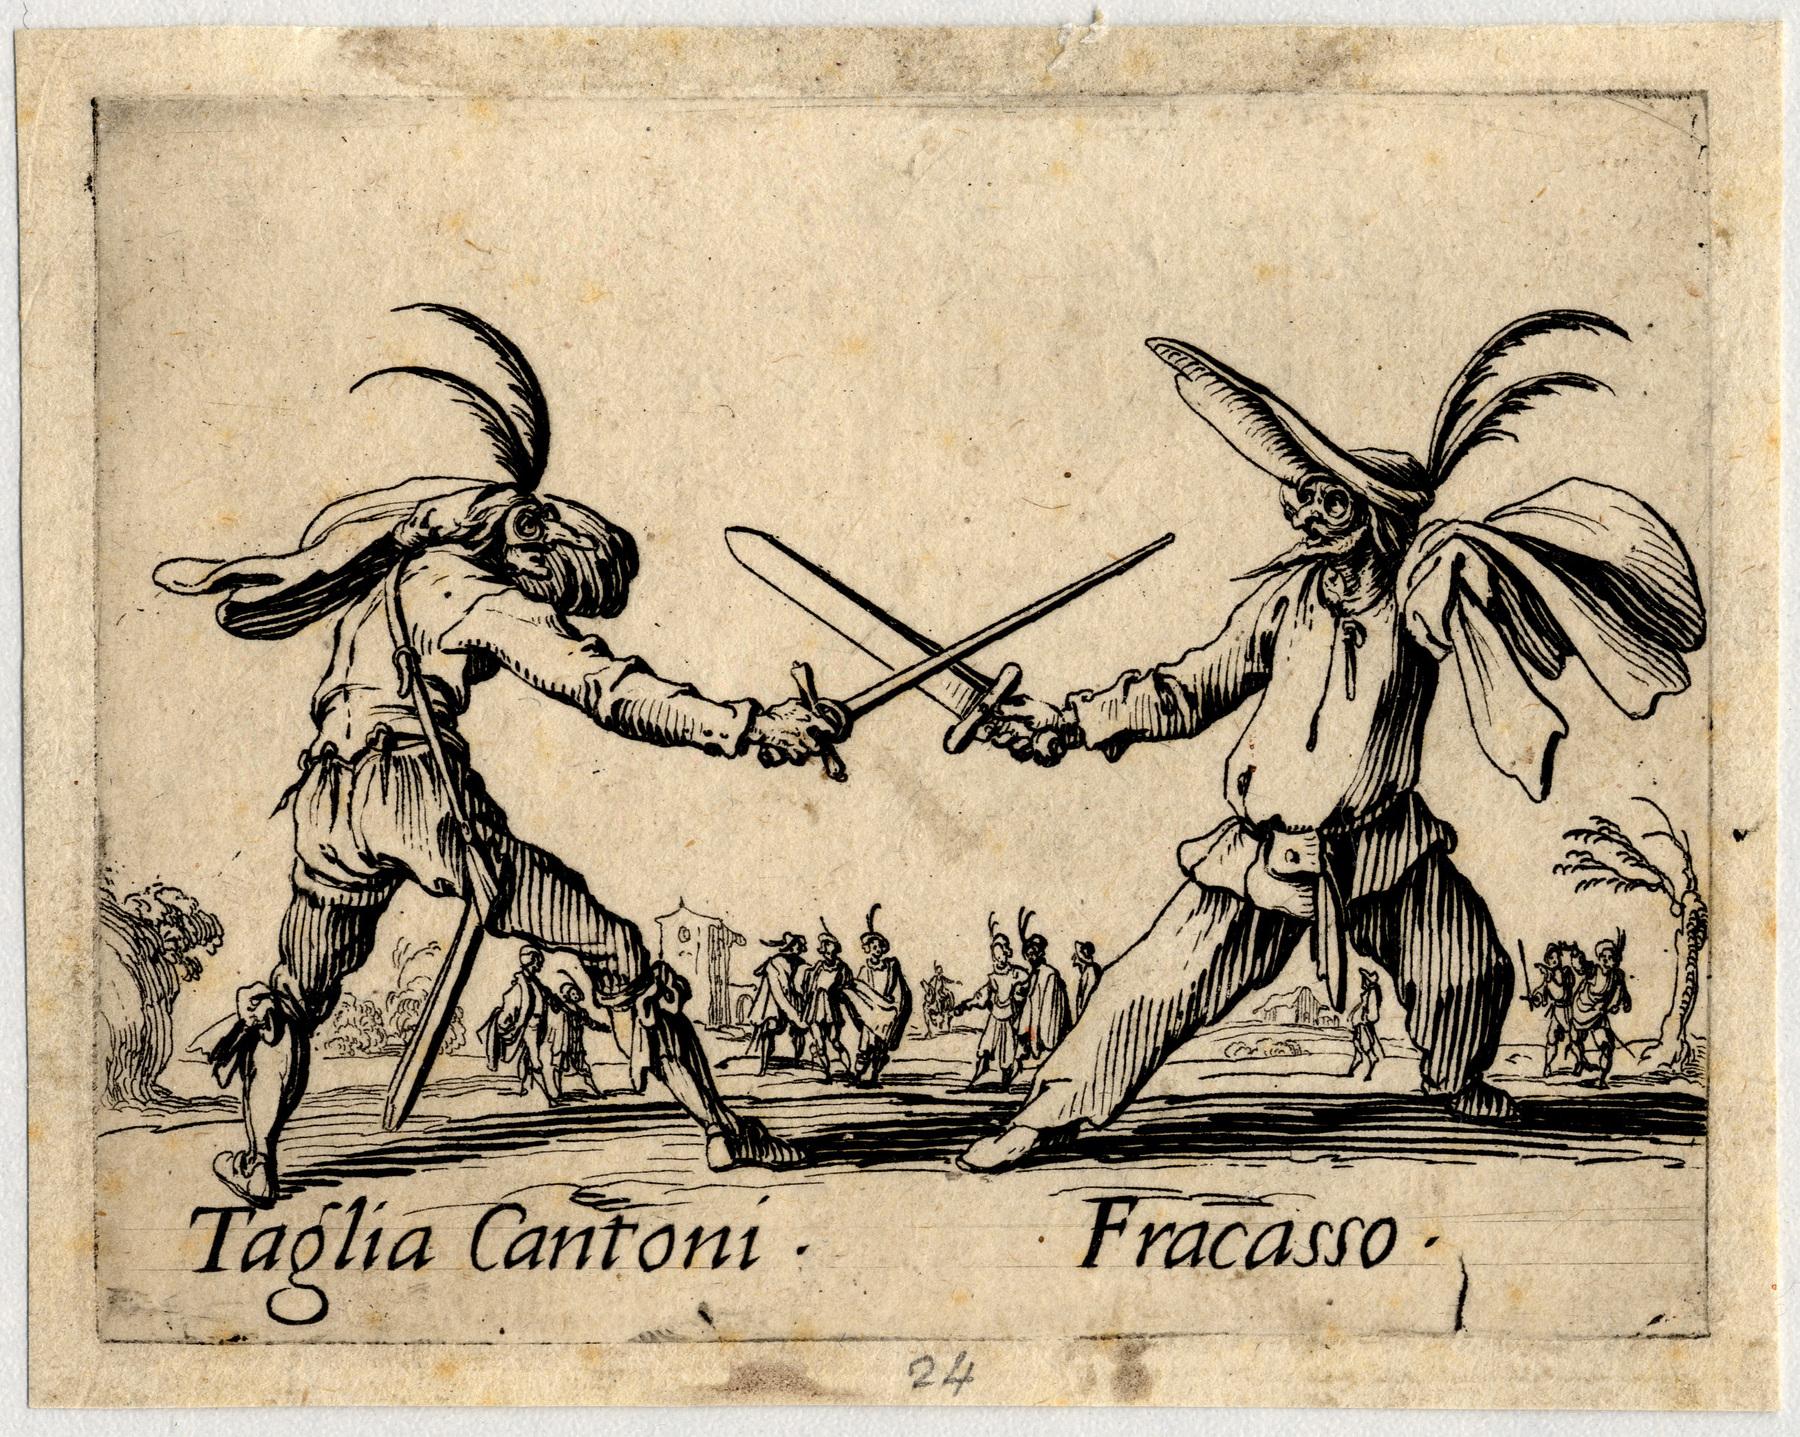 Contenu du Balli di Sfessania : Taglia Cantoni, Fracasso